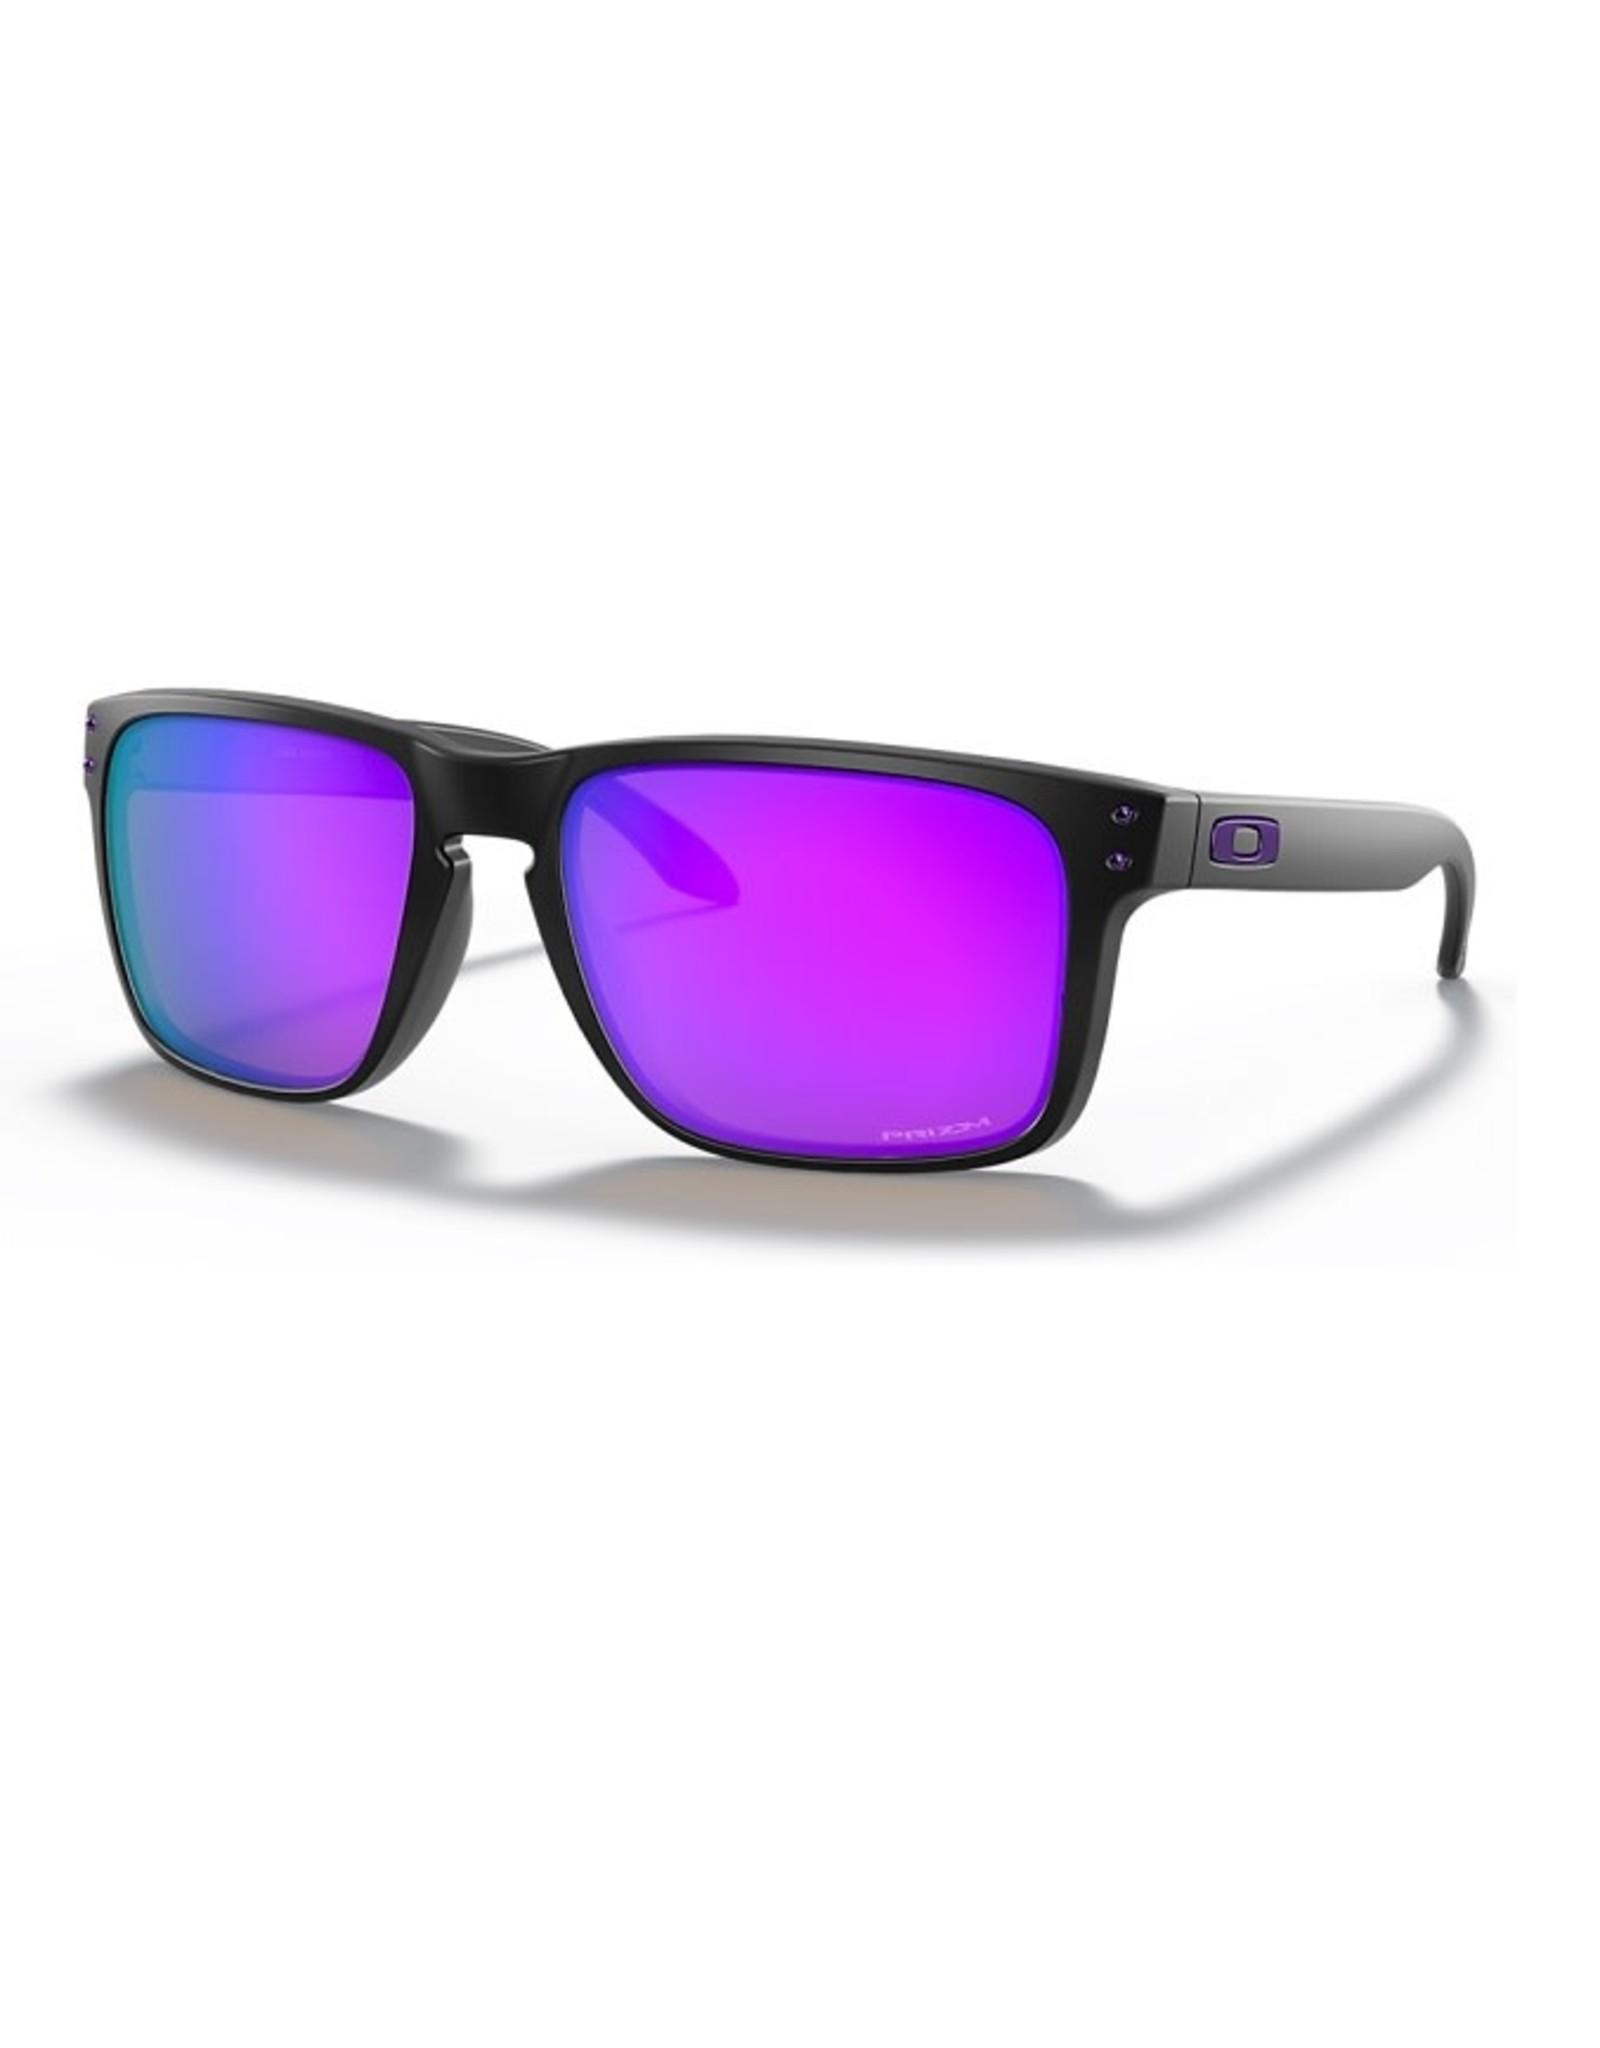 Oakley HOLBROOK XL Matte Black, Prizm Violet Iridium